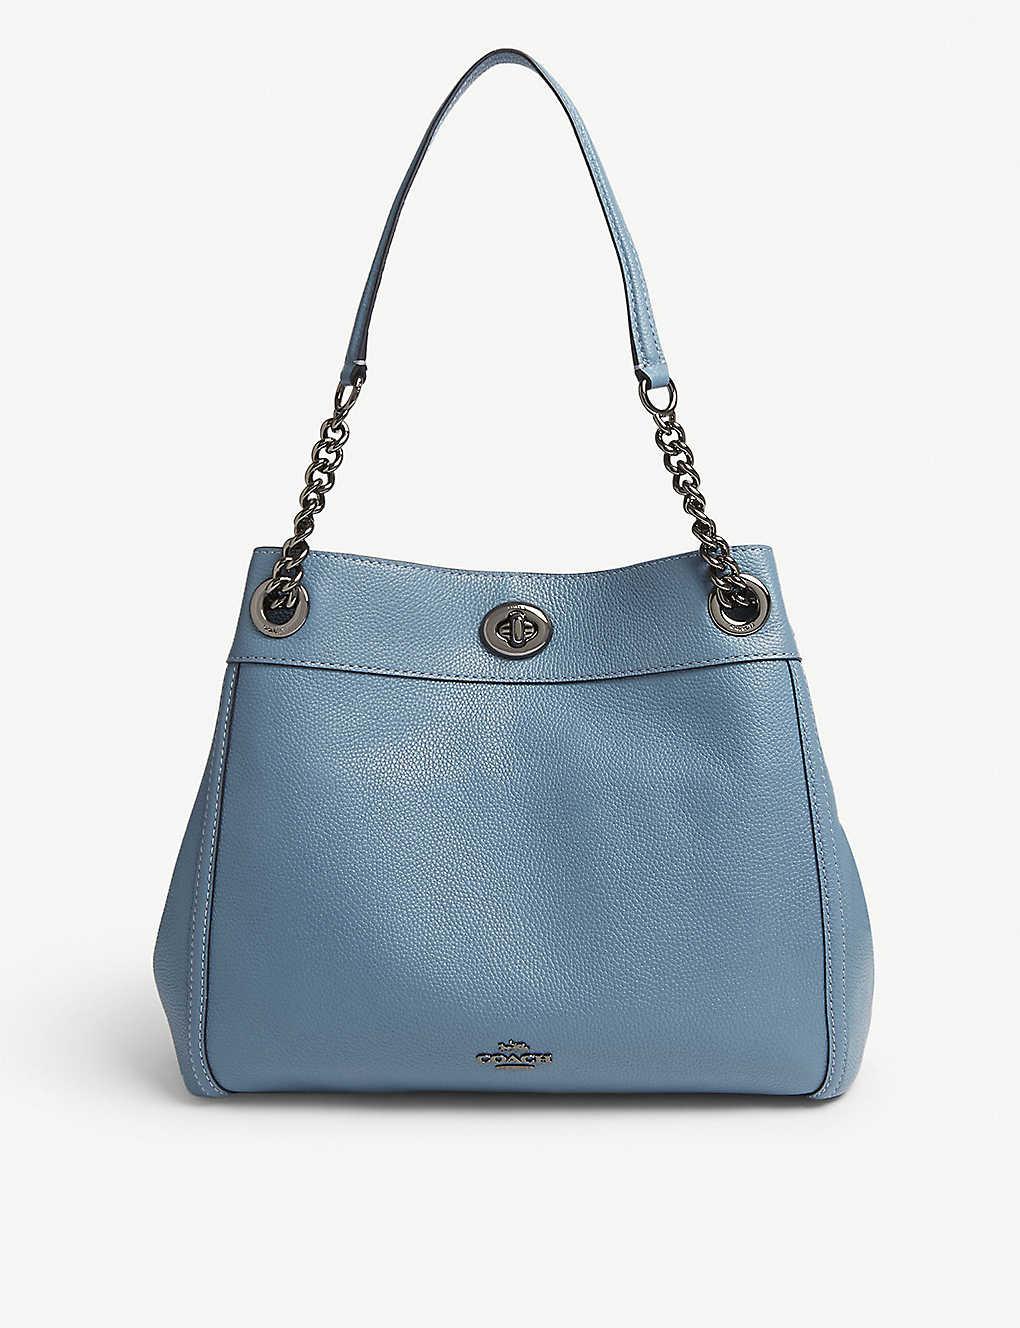 COACH - Edie leather shoulder bag  f094ee1f8cf8e